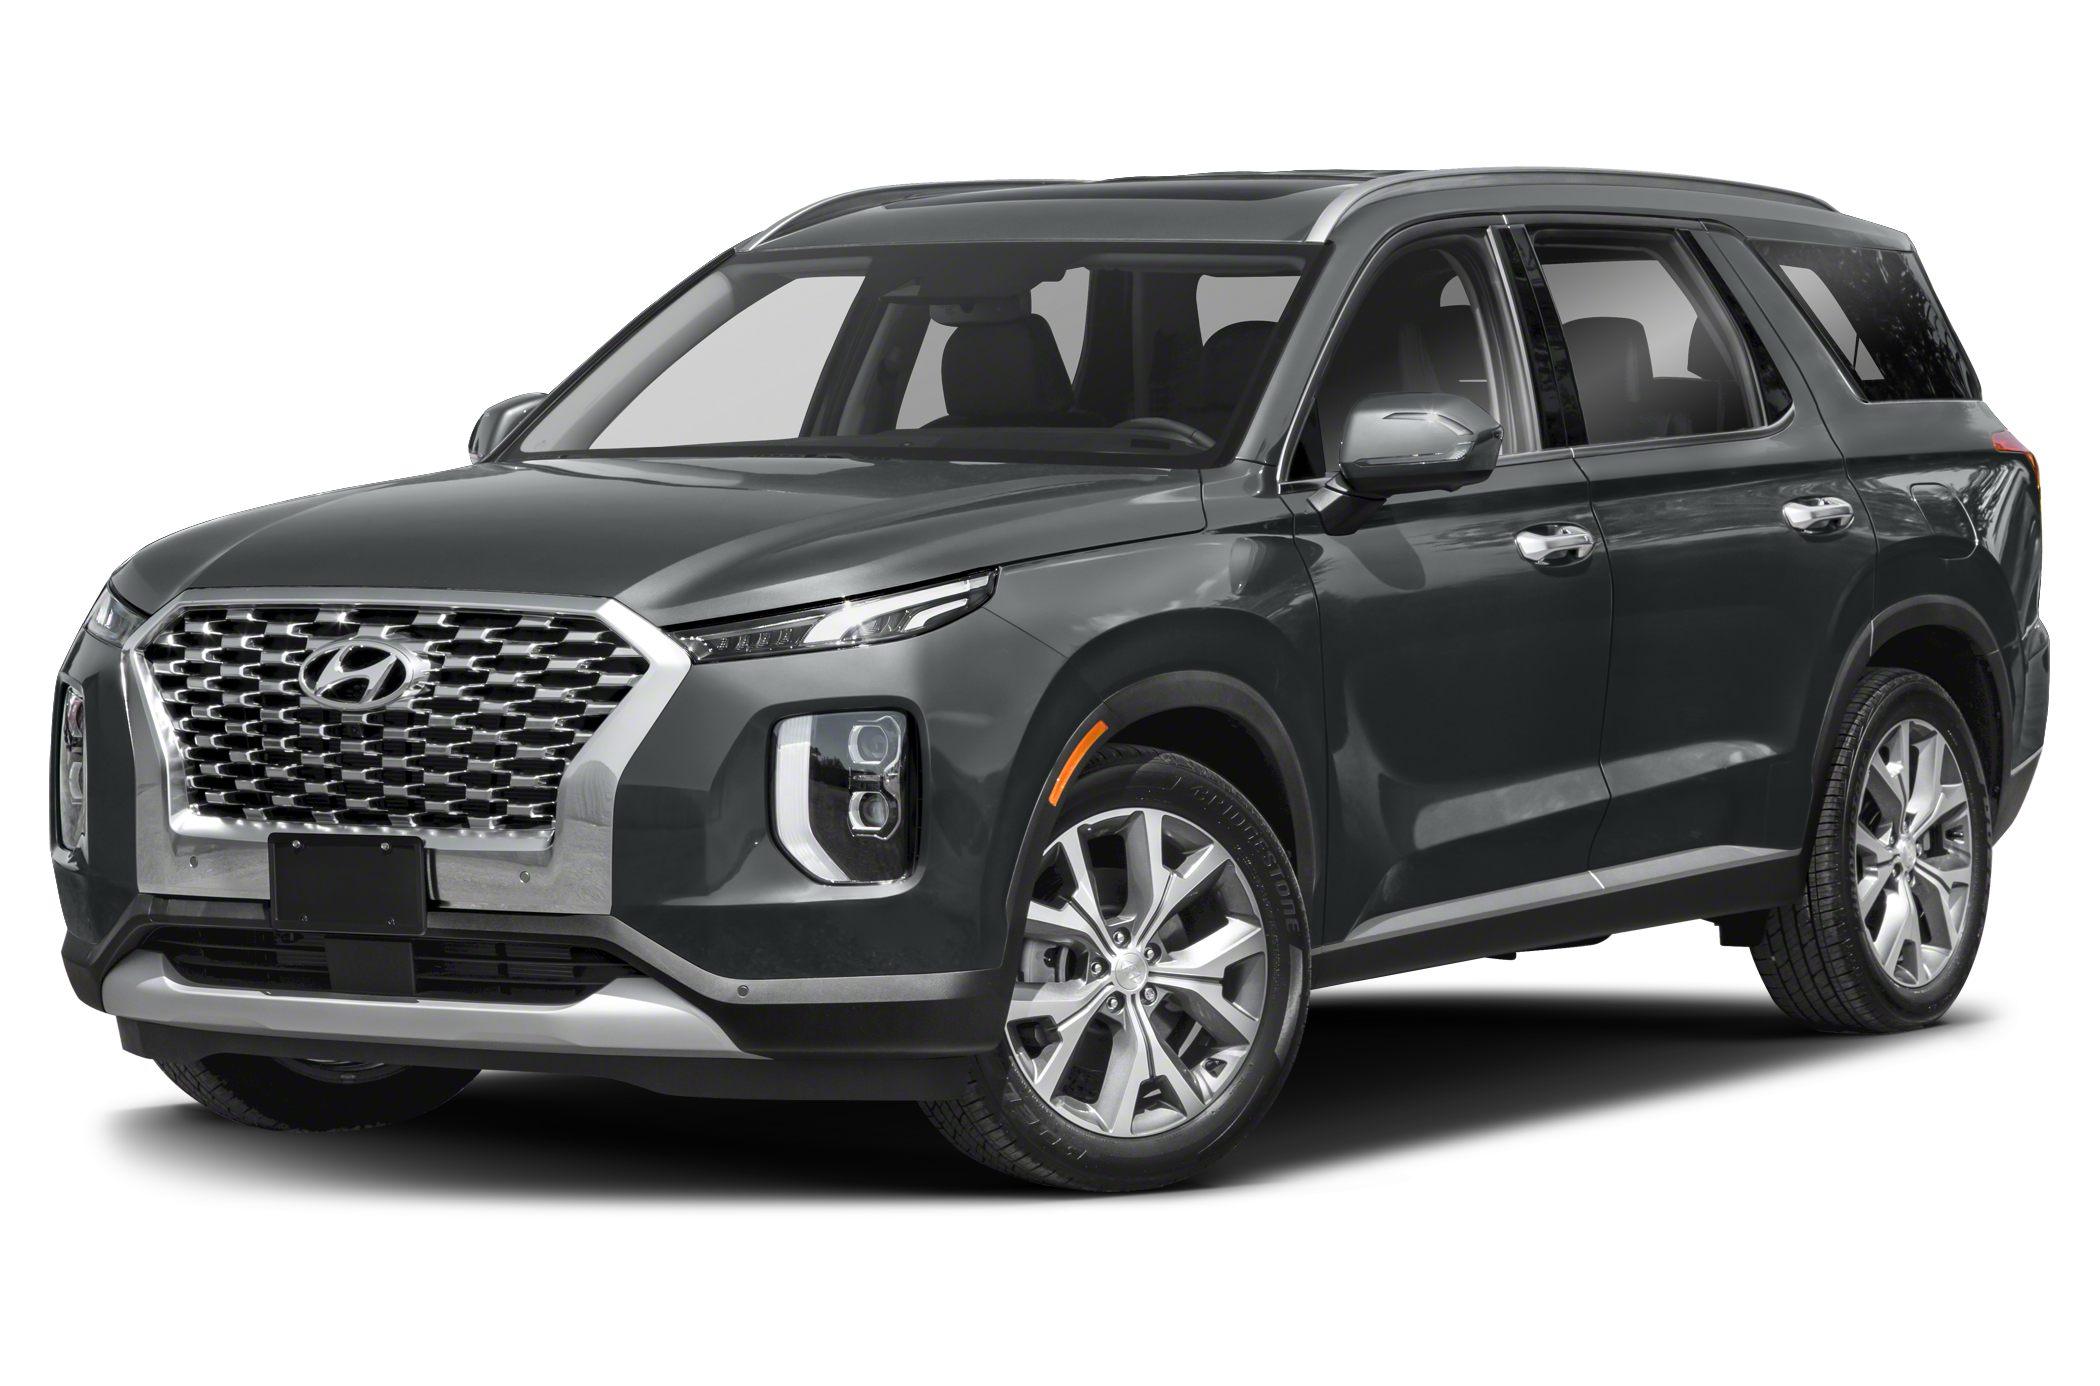 2020 Hyundai Palisade Owner Reviews And Ratings